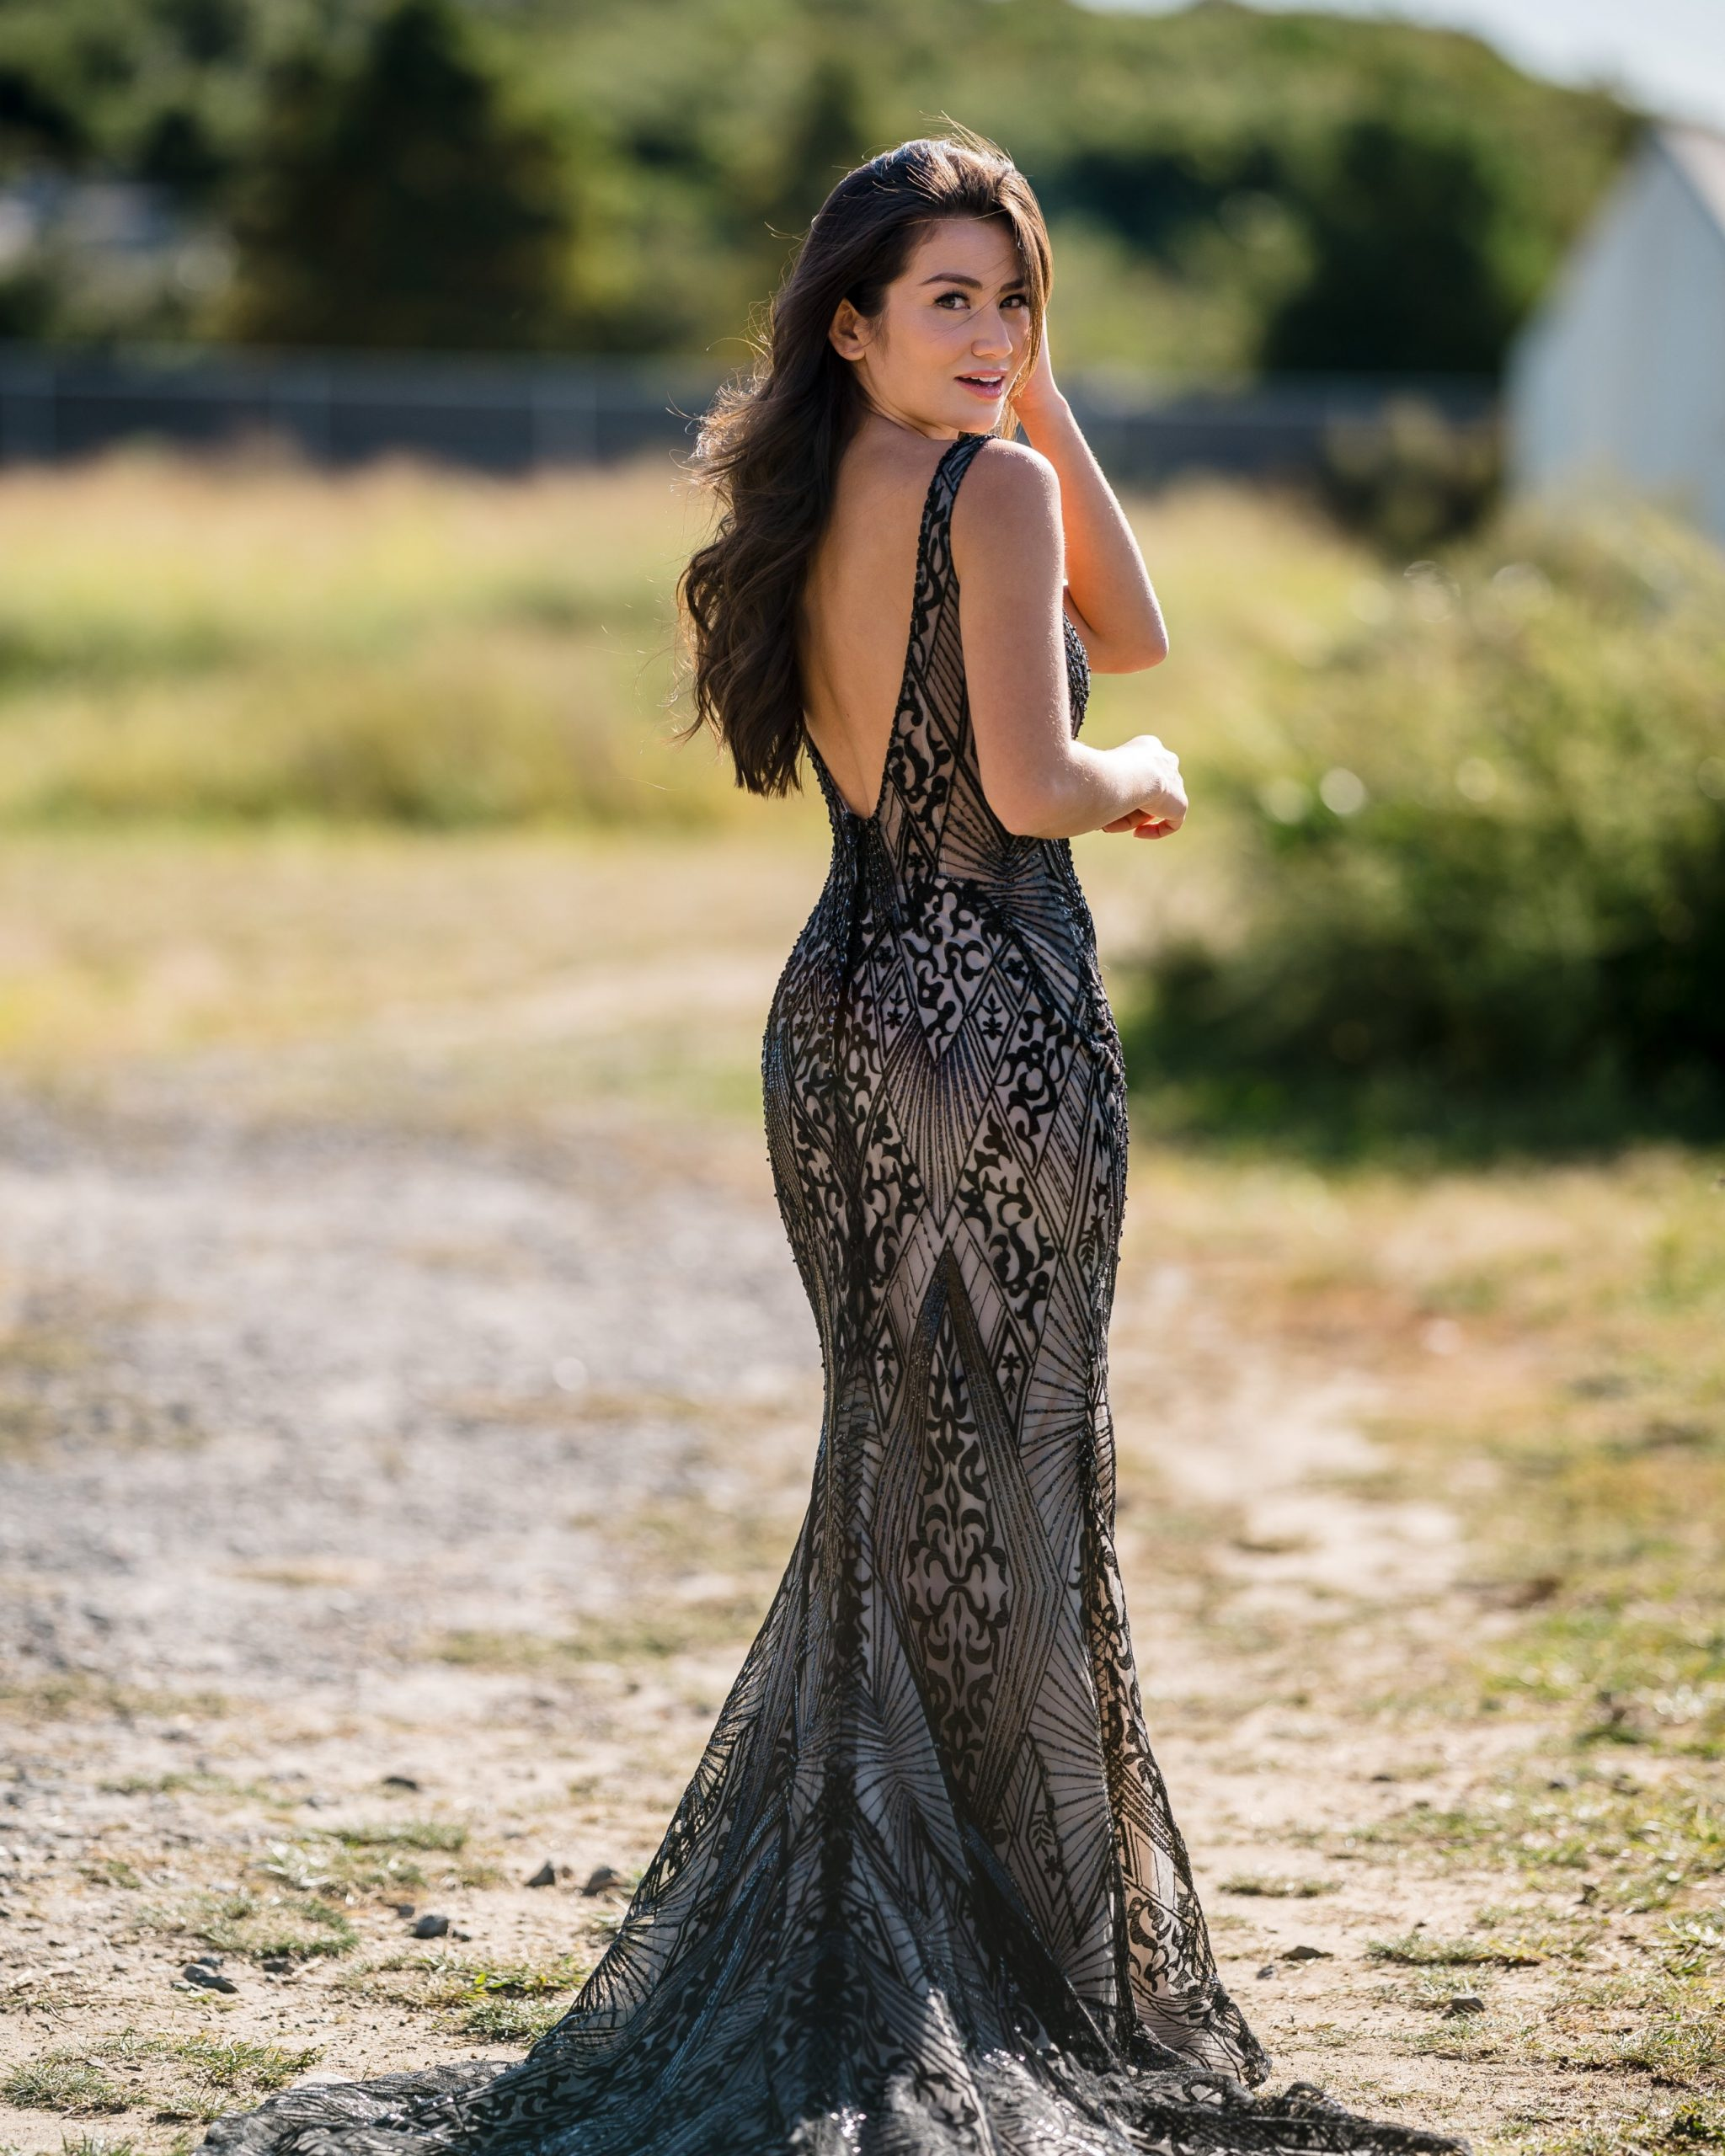 Influencer Caila Quinn Wearing Black Sheath Wedding Dress Called Elaine by Maggie Sottero